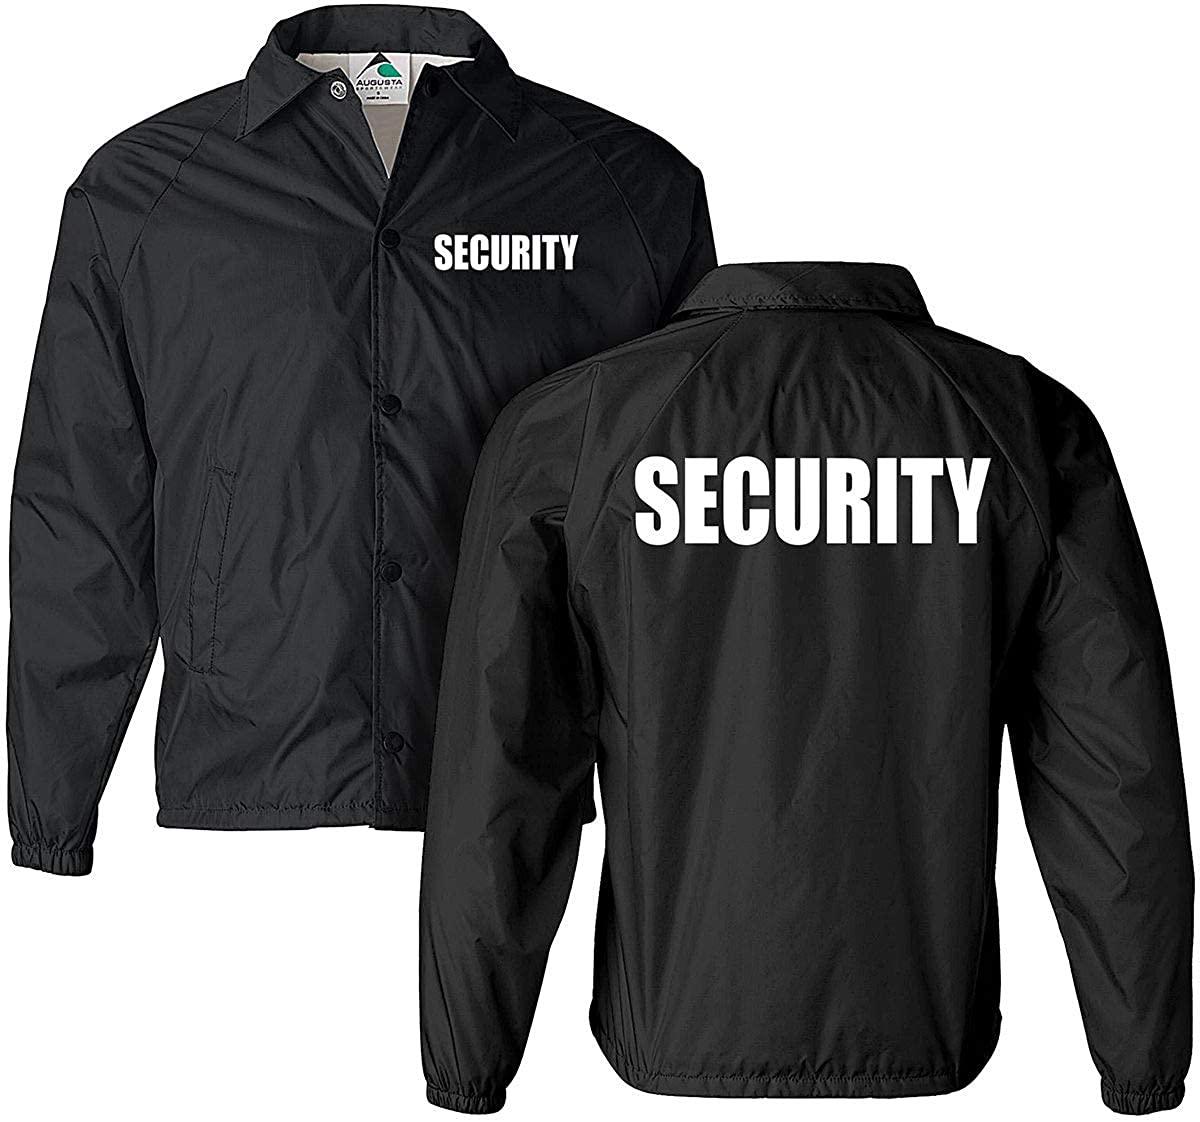 Smart People Clothing Security Jacket, Nylon, Security Guard Jacket, Law Enforcement, Windbreaker